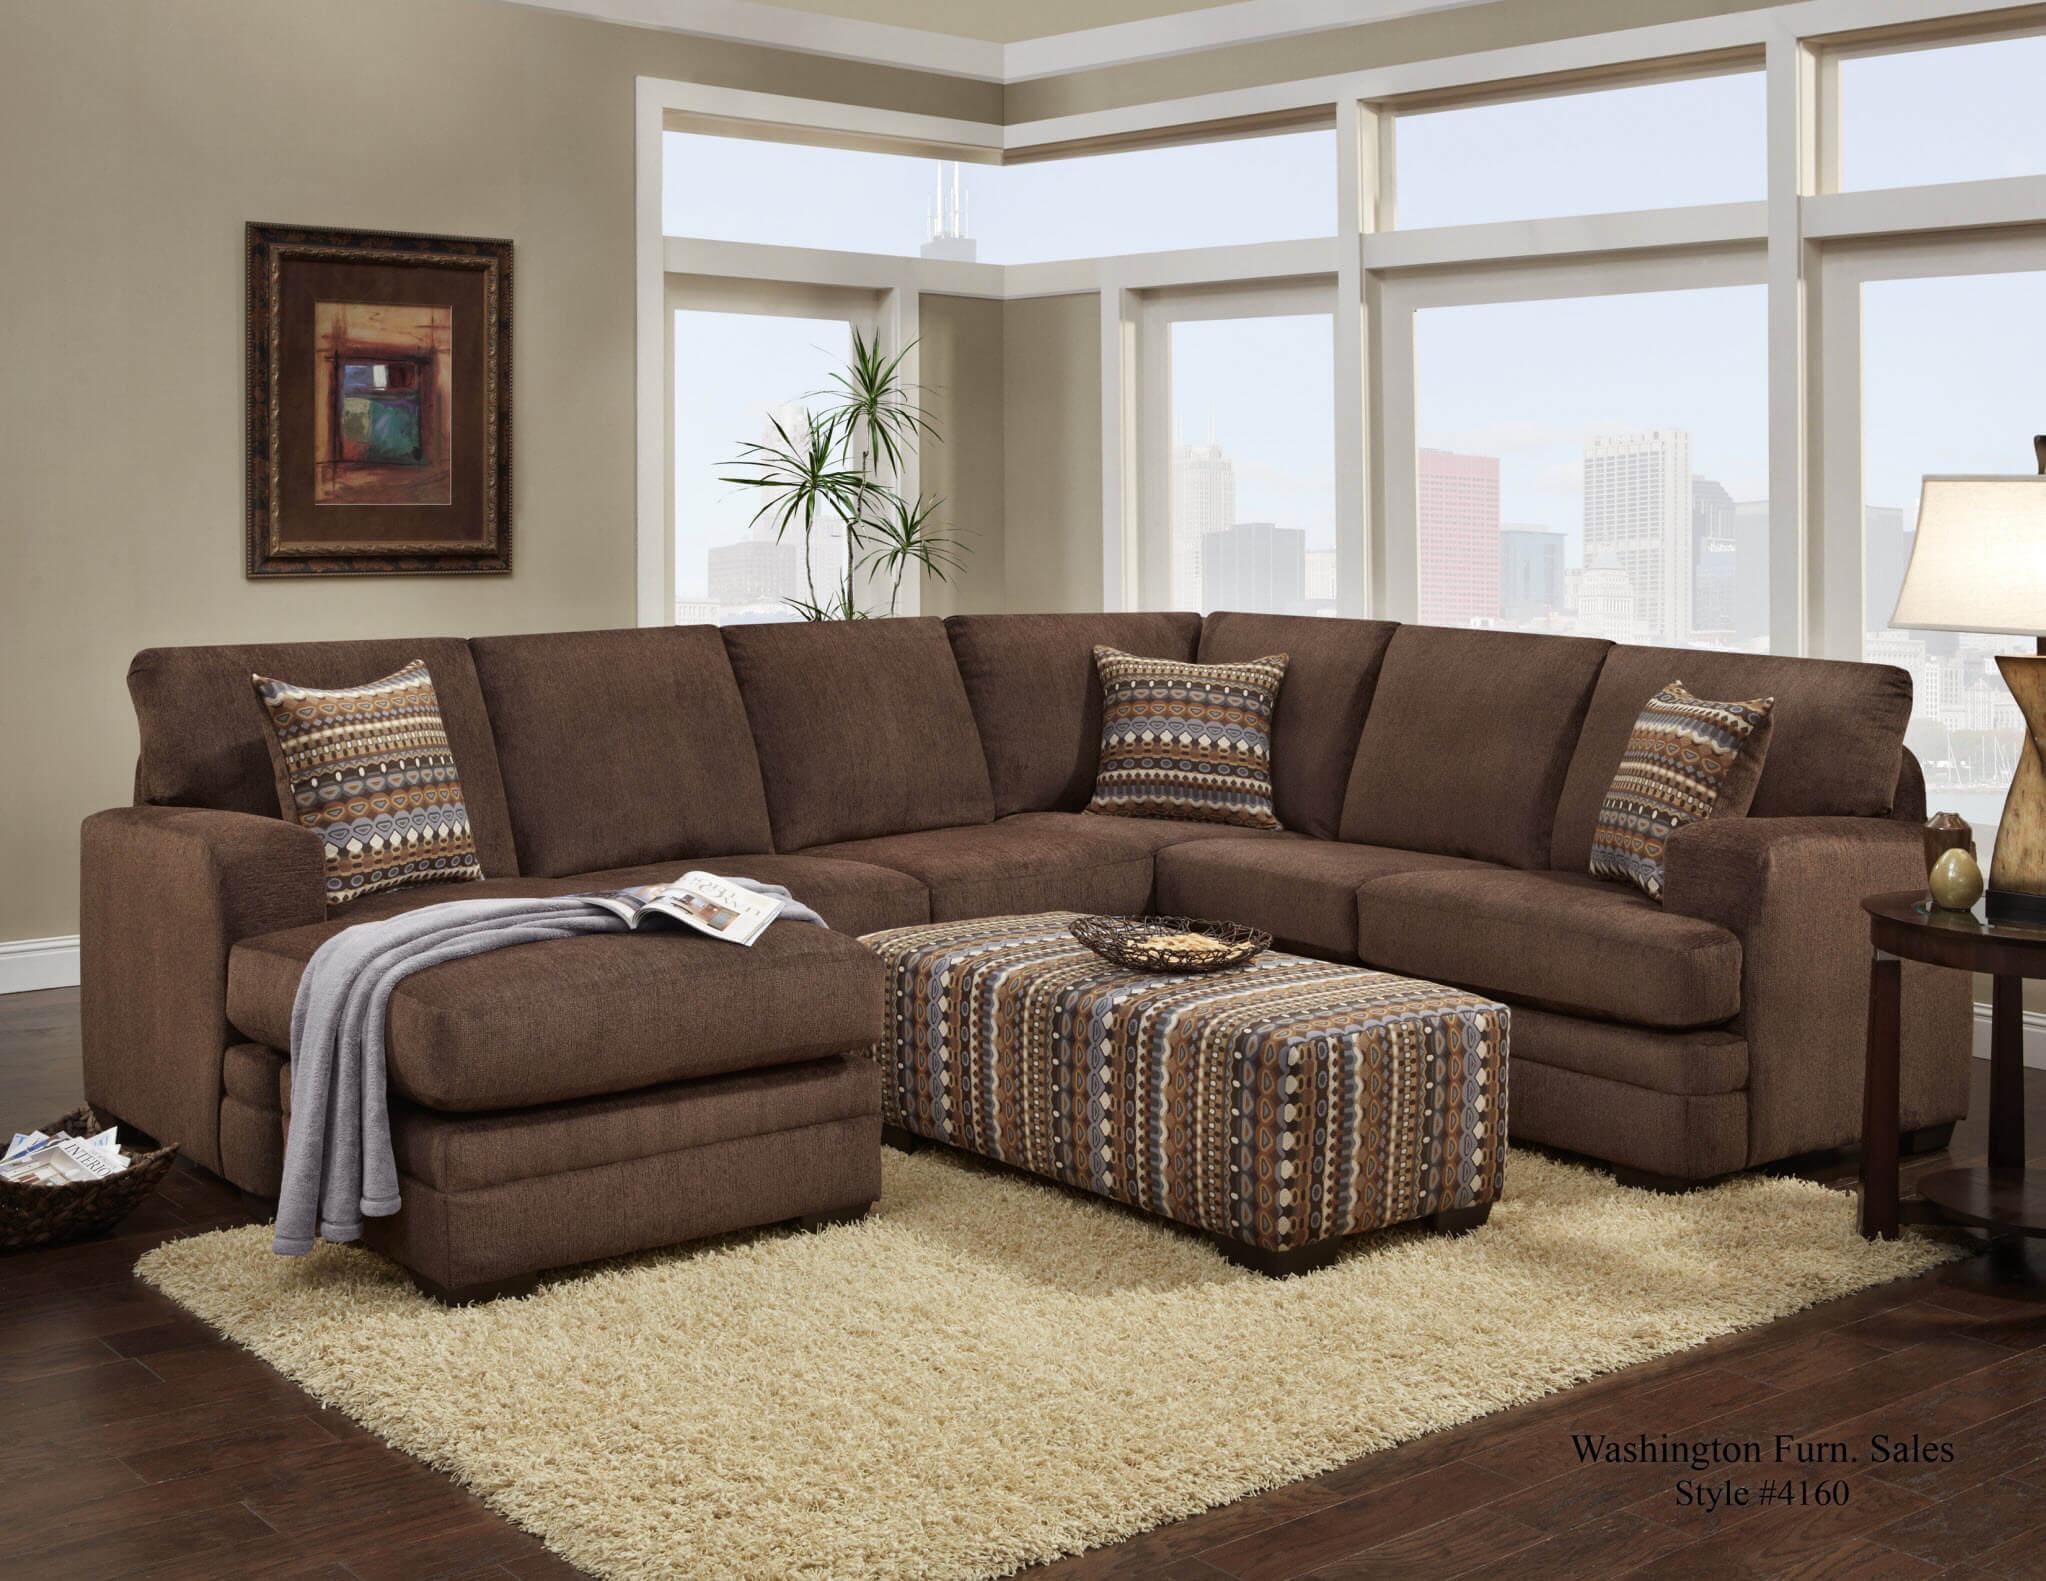 sectional loveseat sofa second hand designer sofas hillel chocolate sets